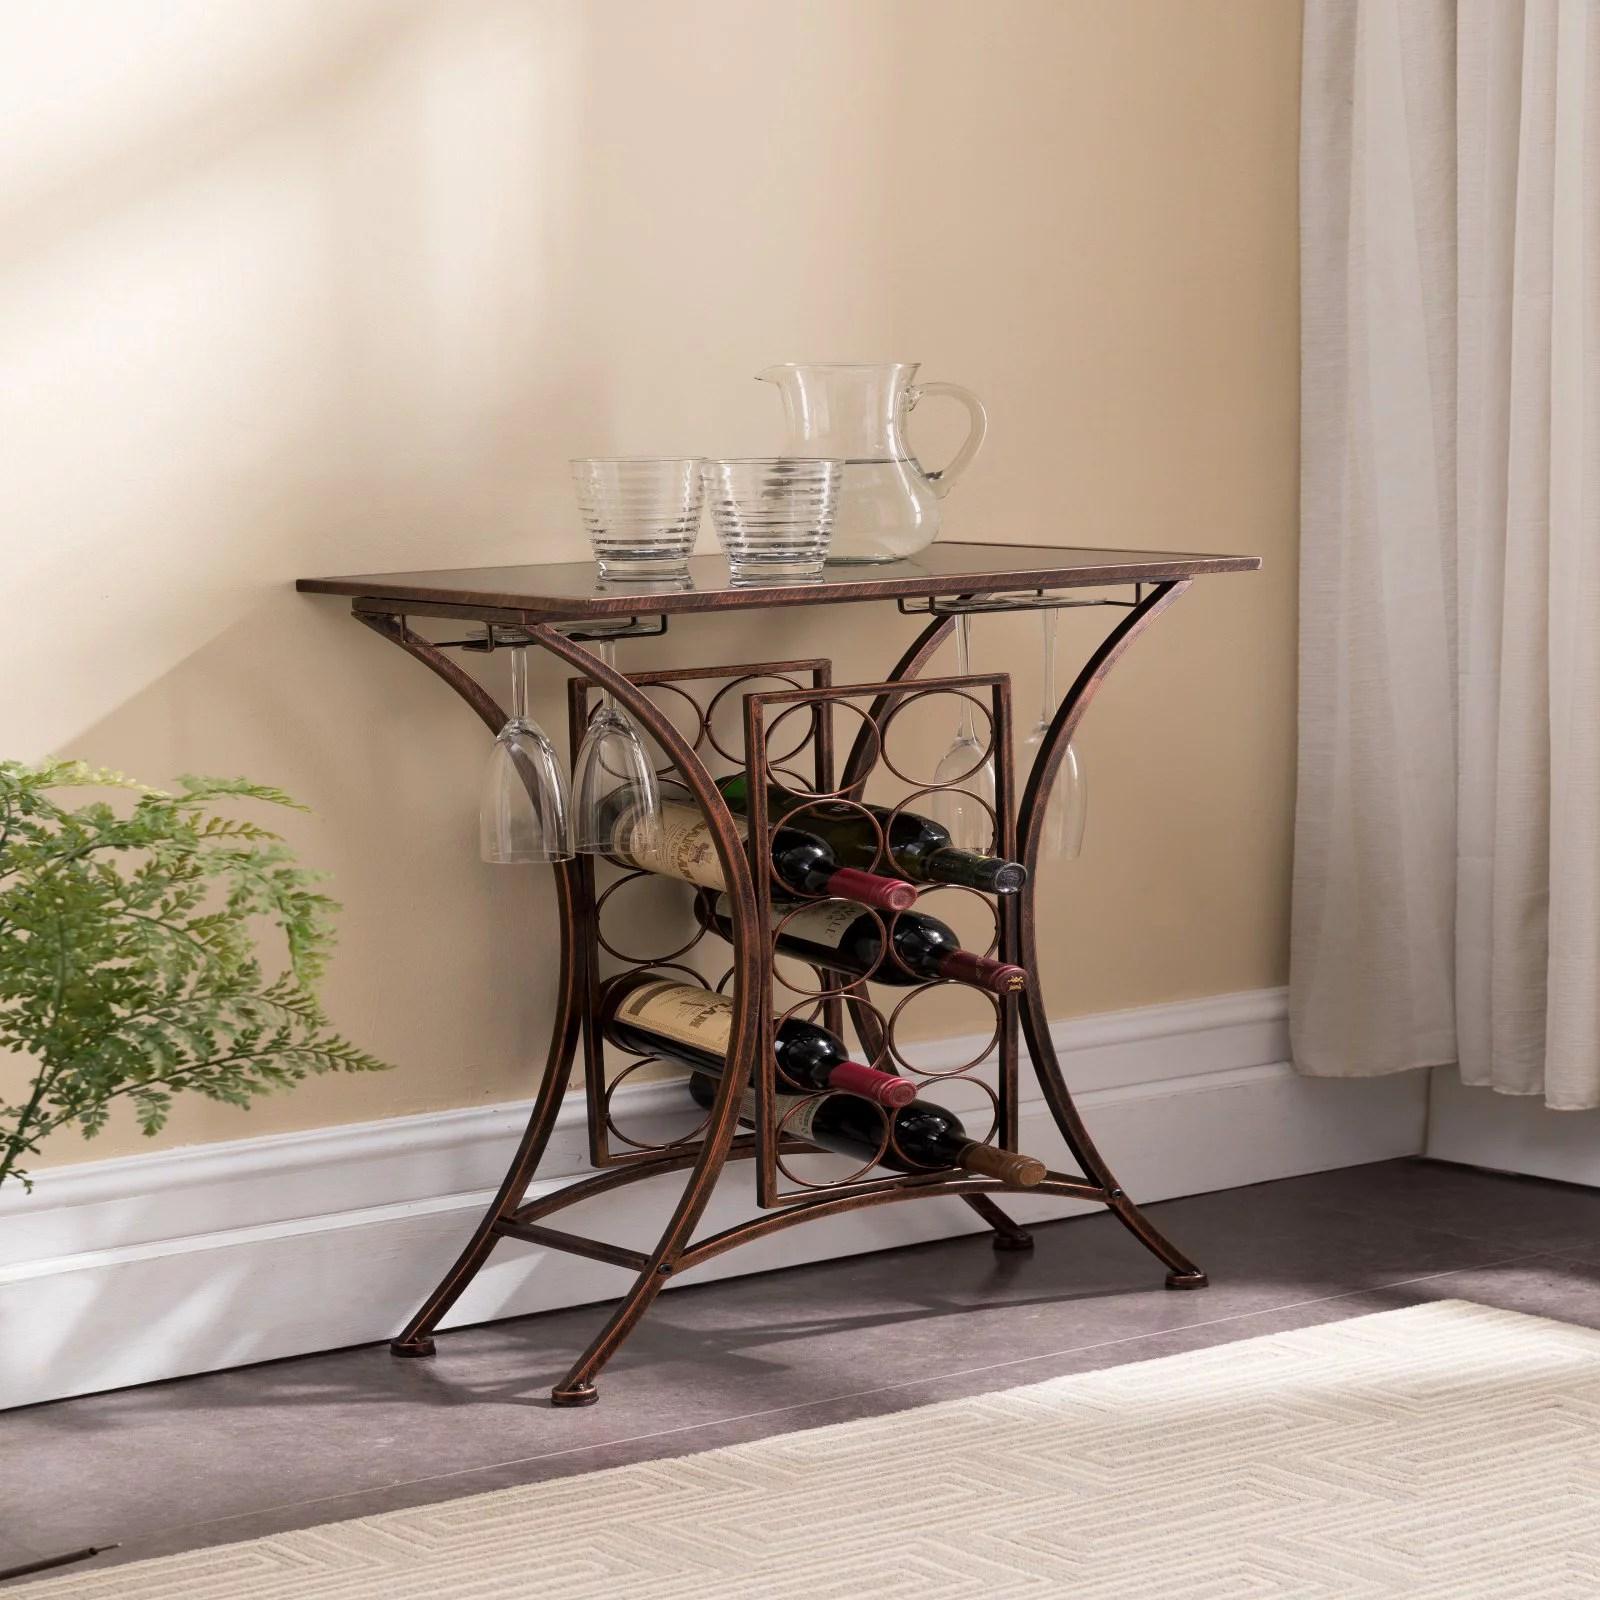 k b furniture wr1367 metal 10 bottle wine rack